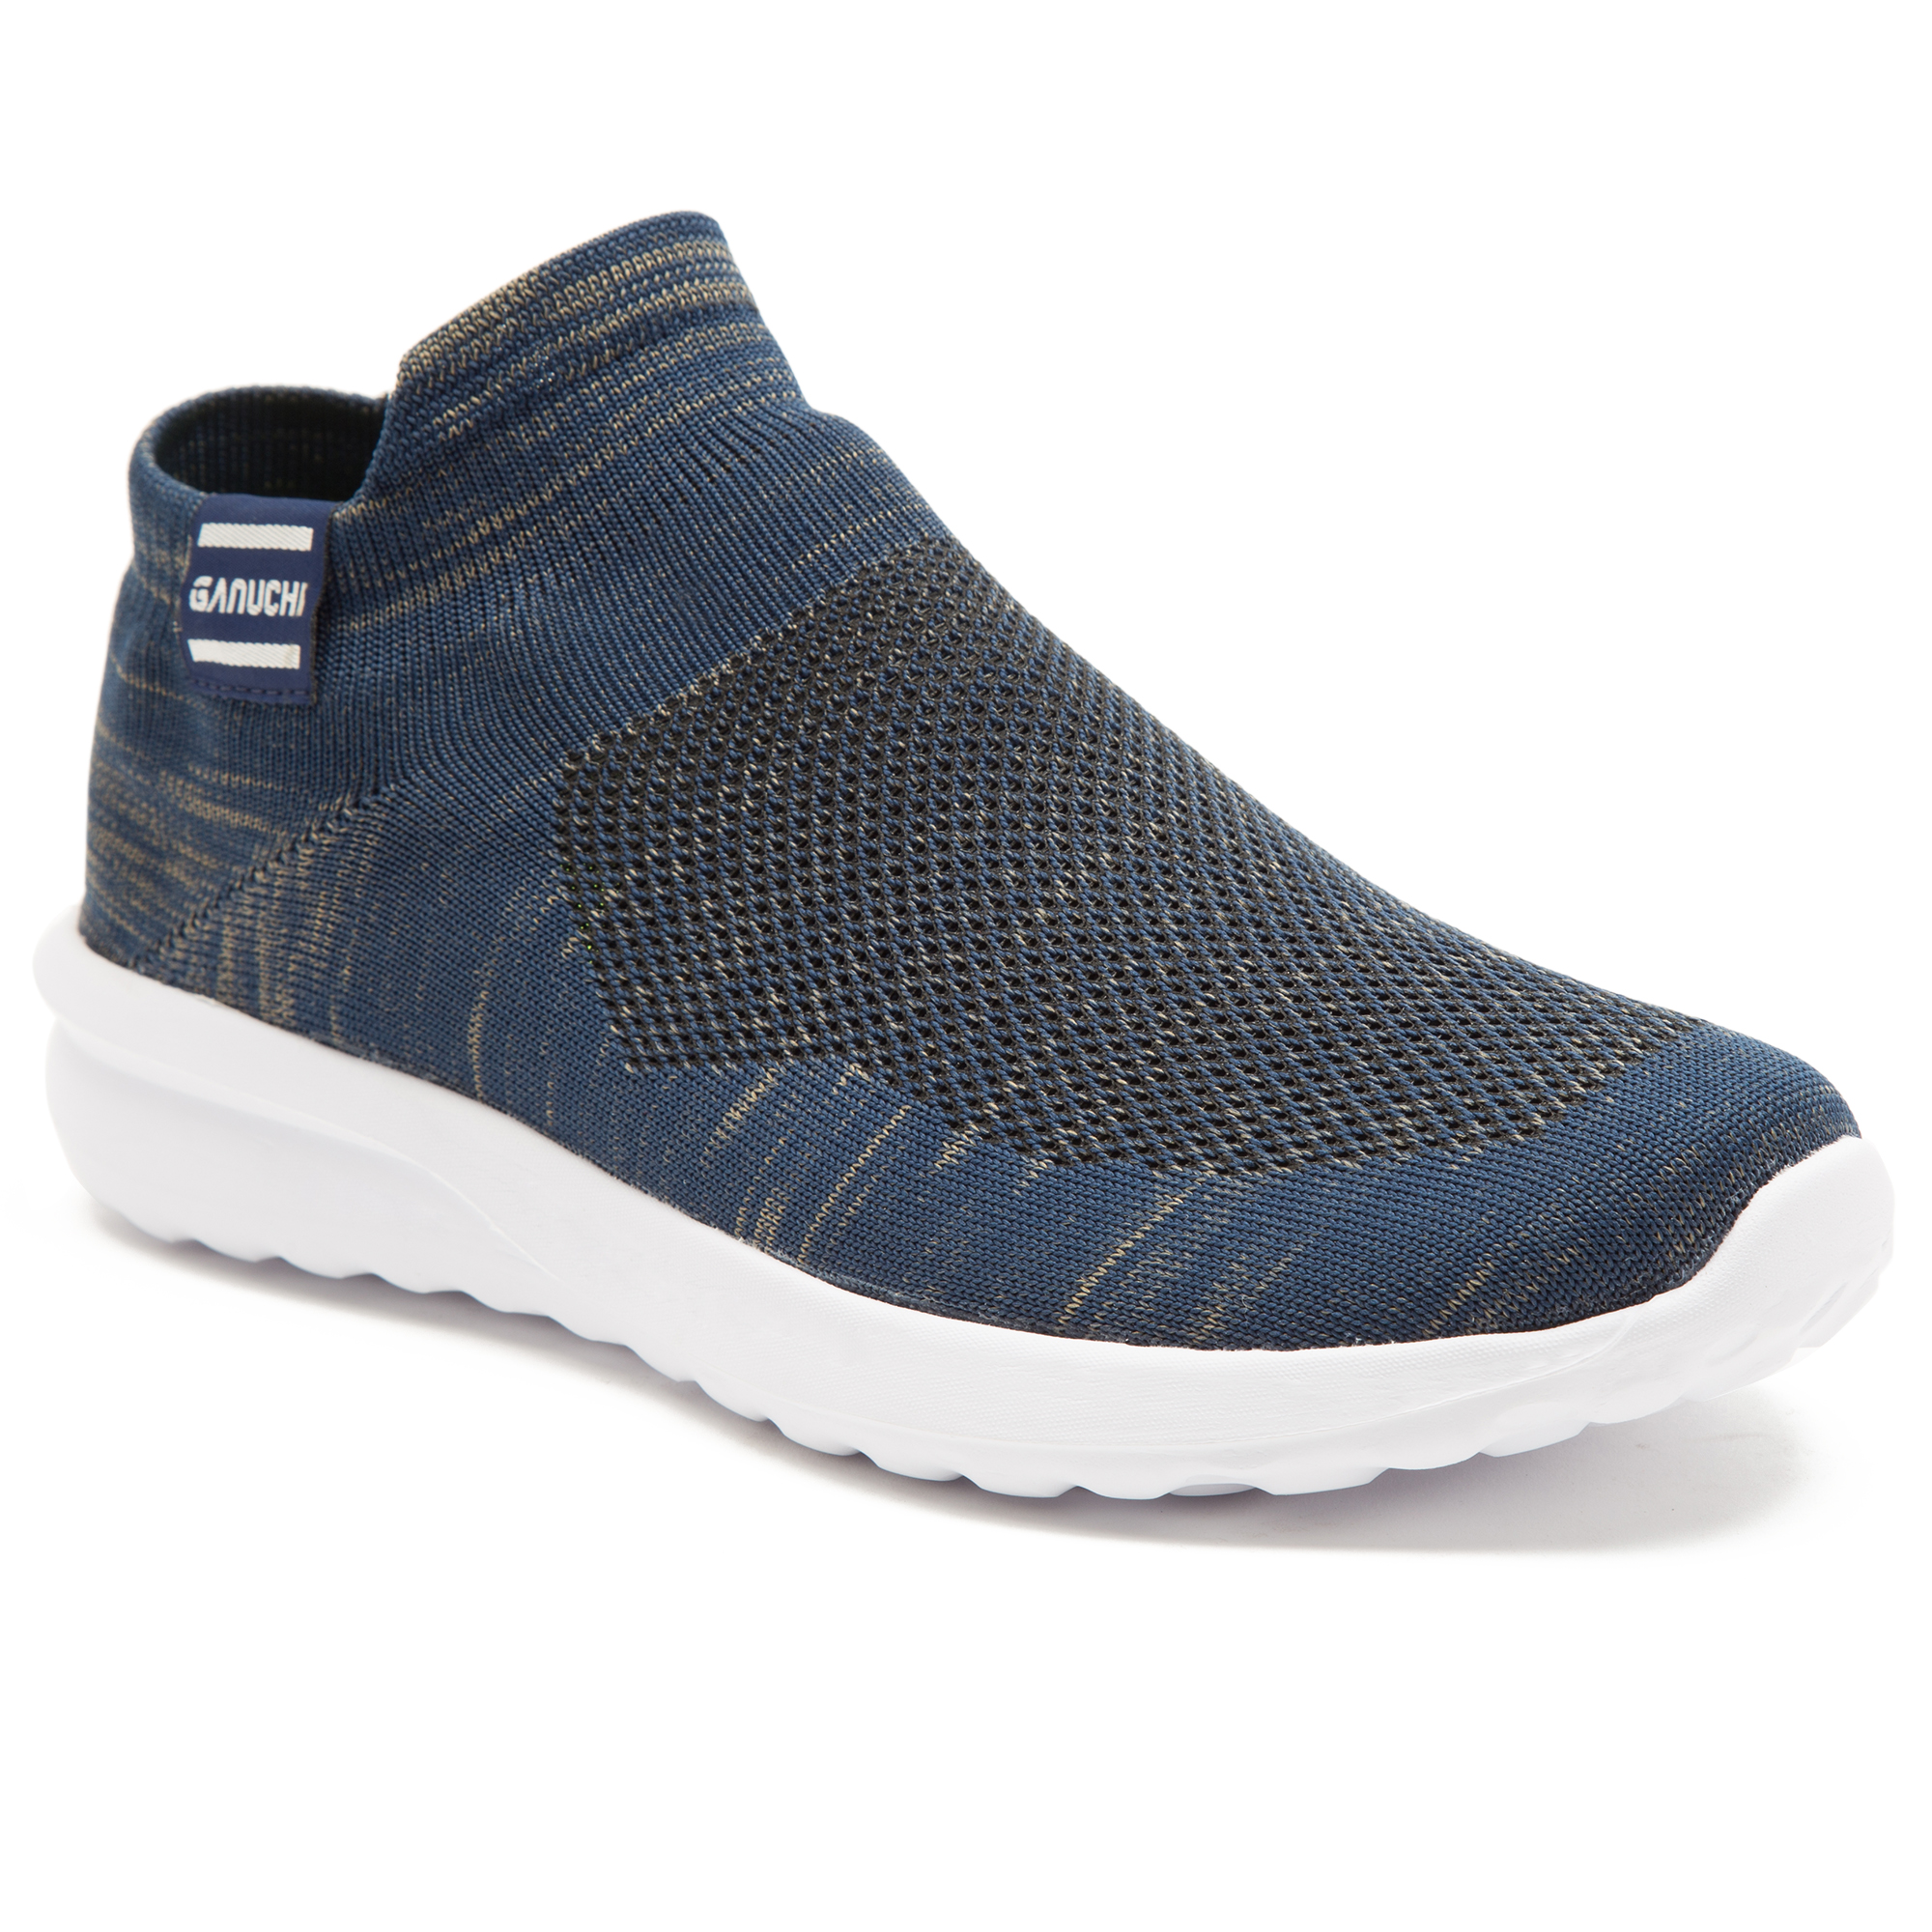 GANUCHI   Ganuchi by Franco Leone Men's Mesh Blue Running Shoes